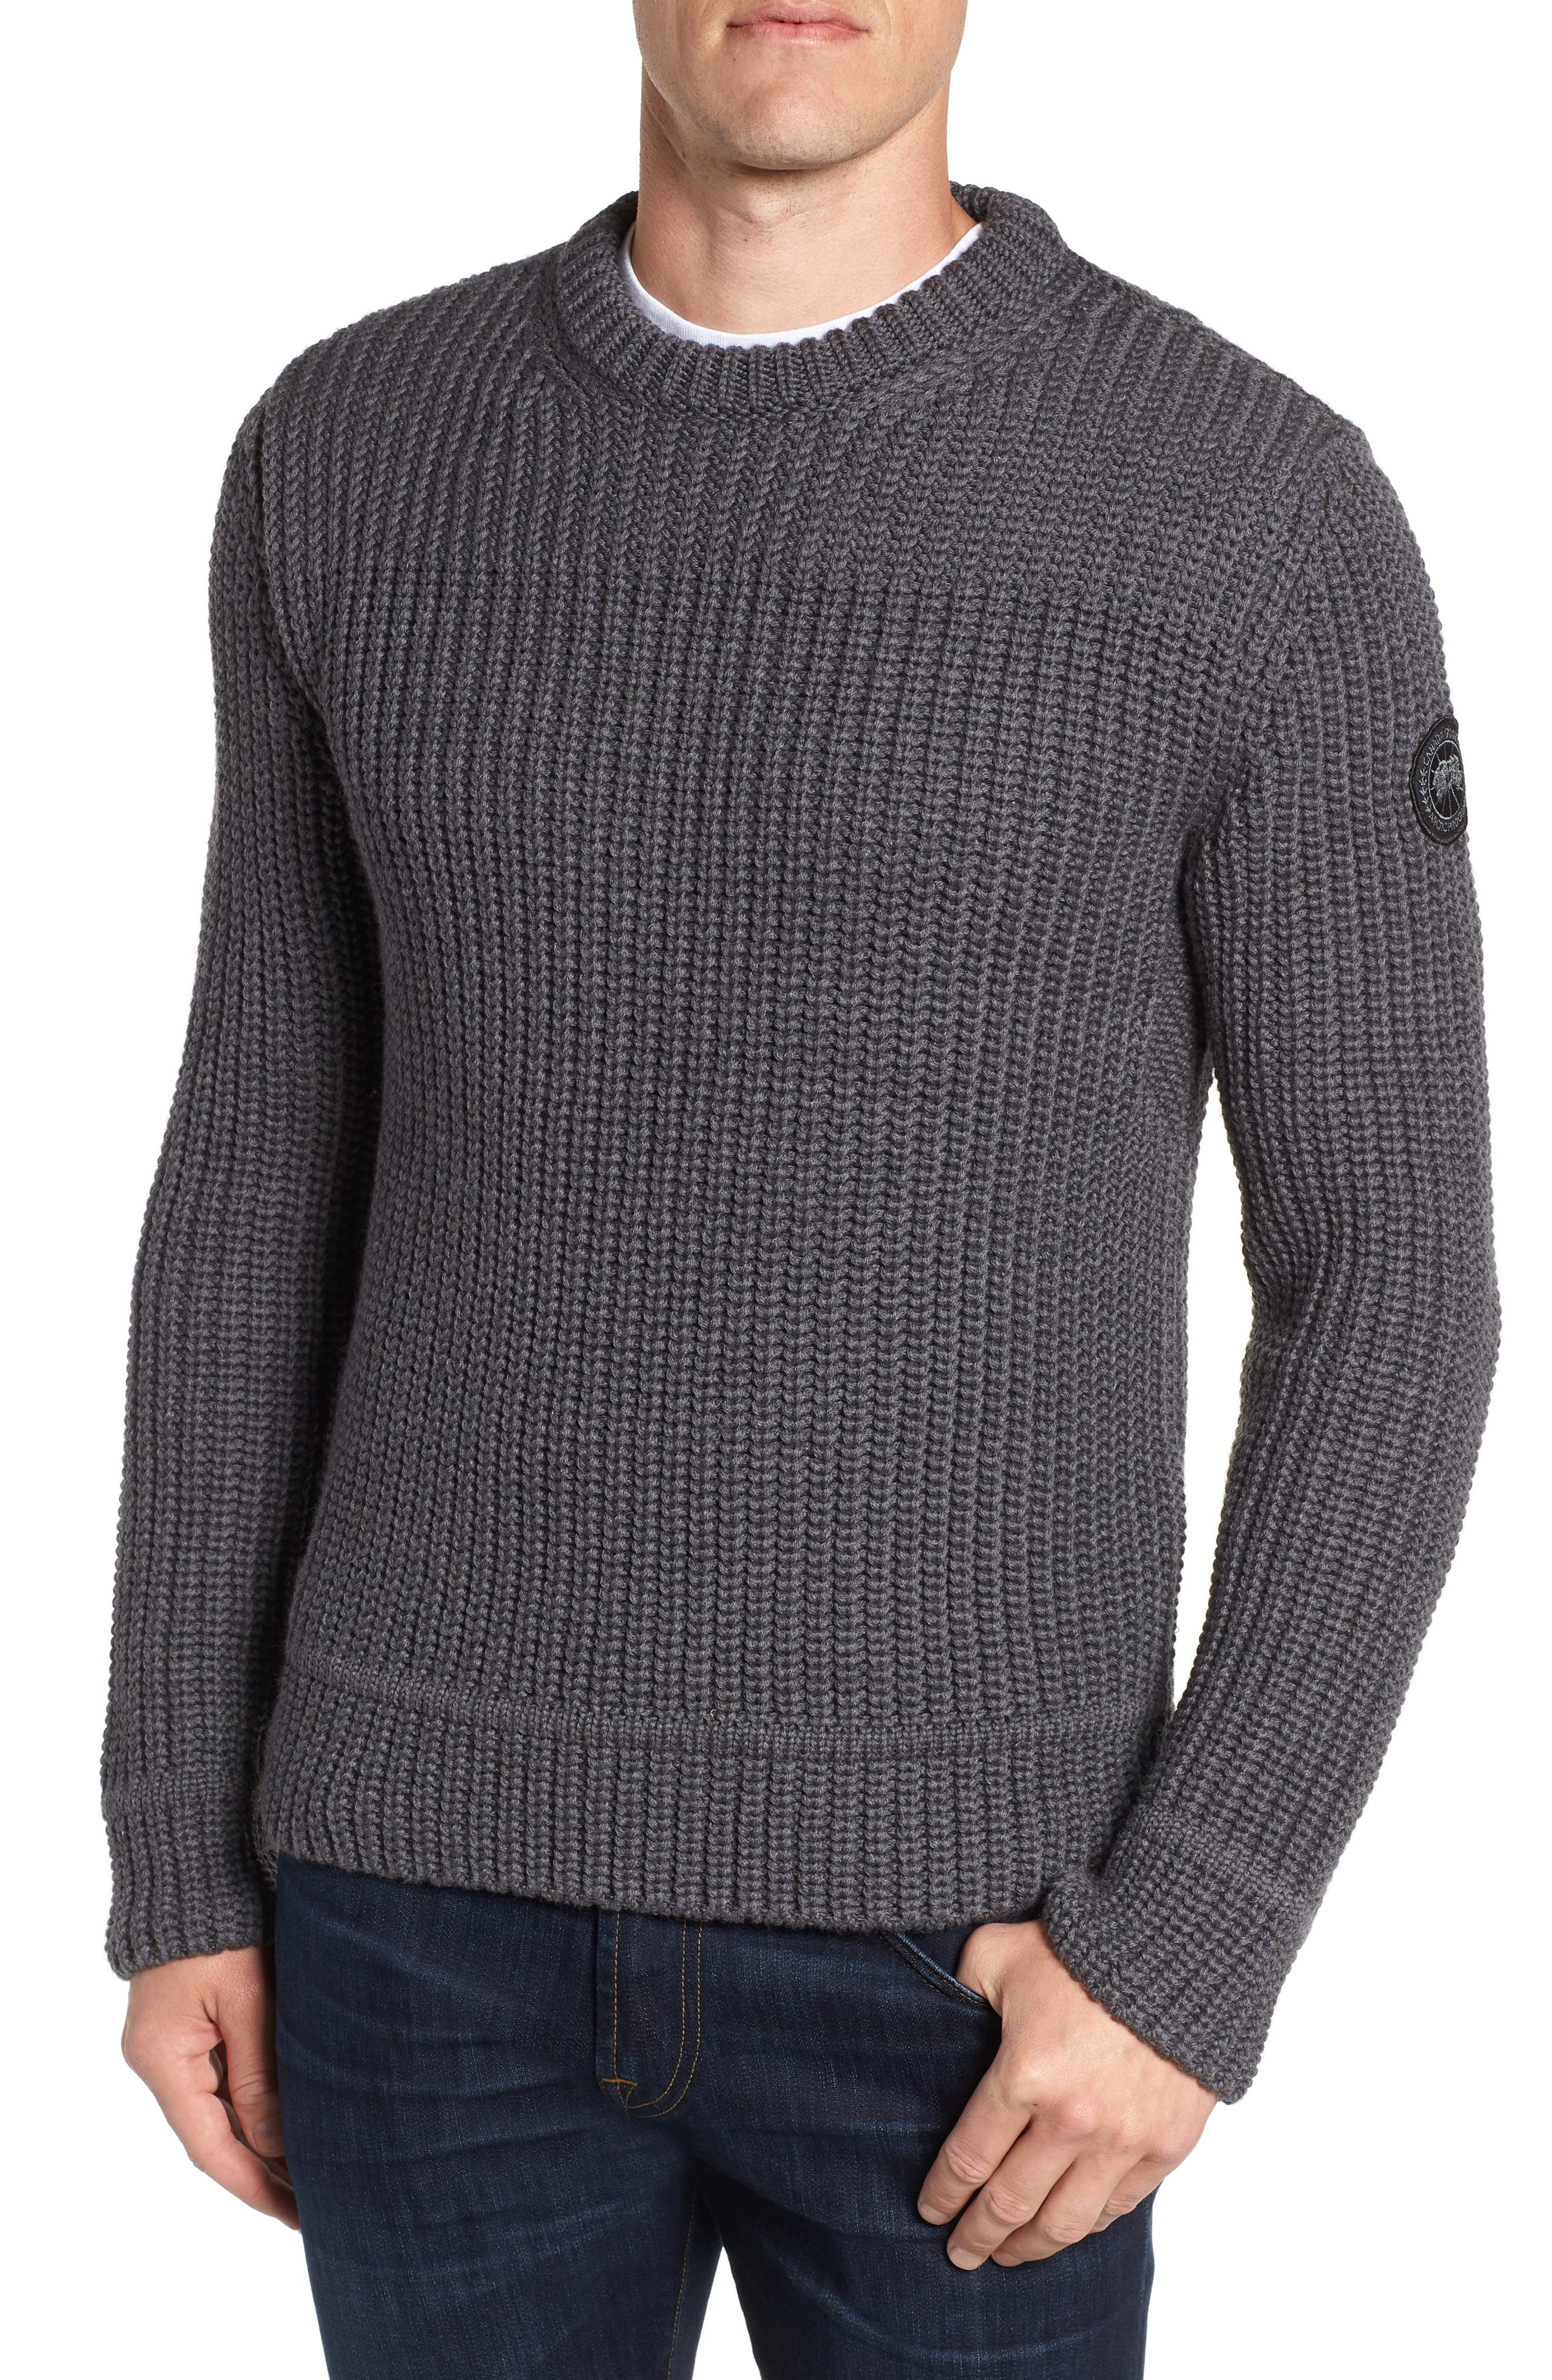 Galloway Regular Fit Merino Wool Sweater in Iron Grey